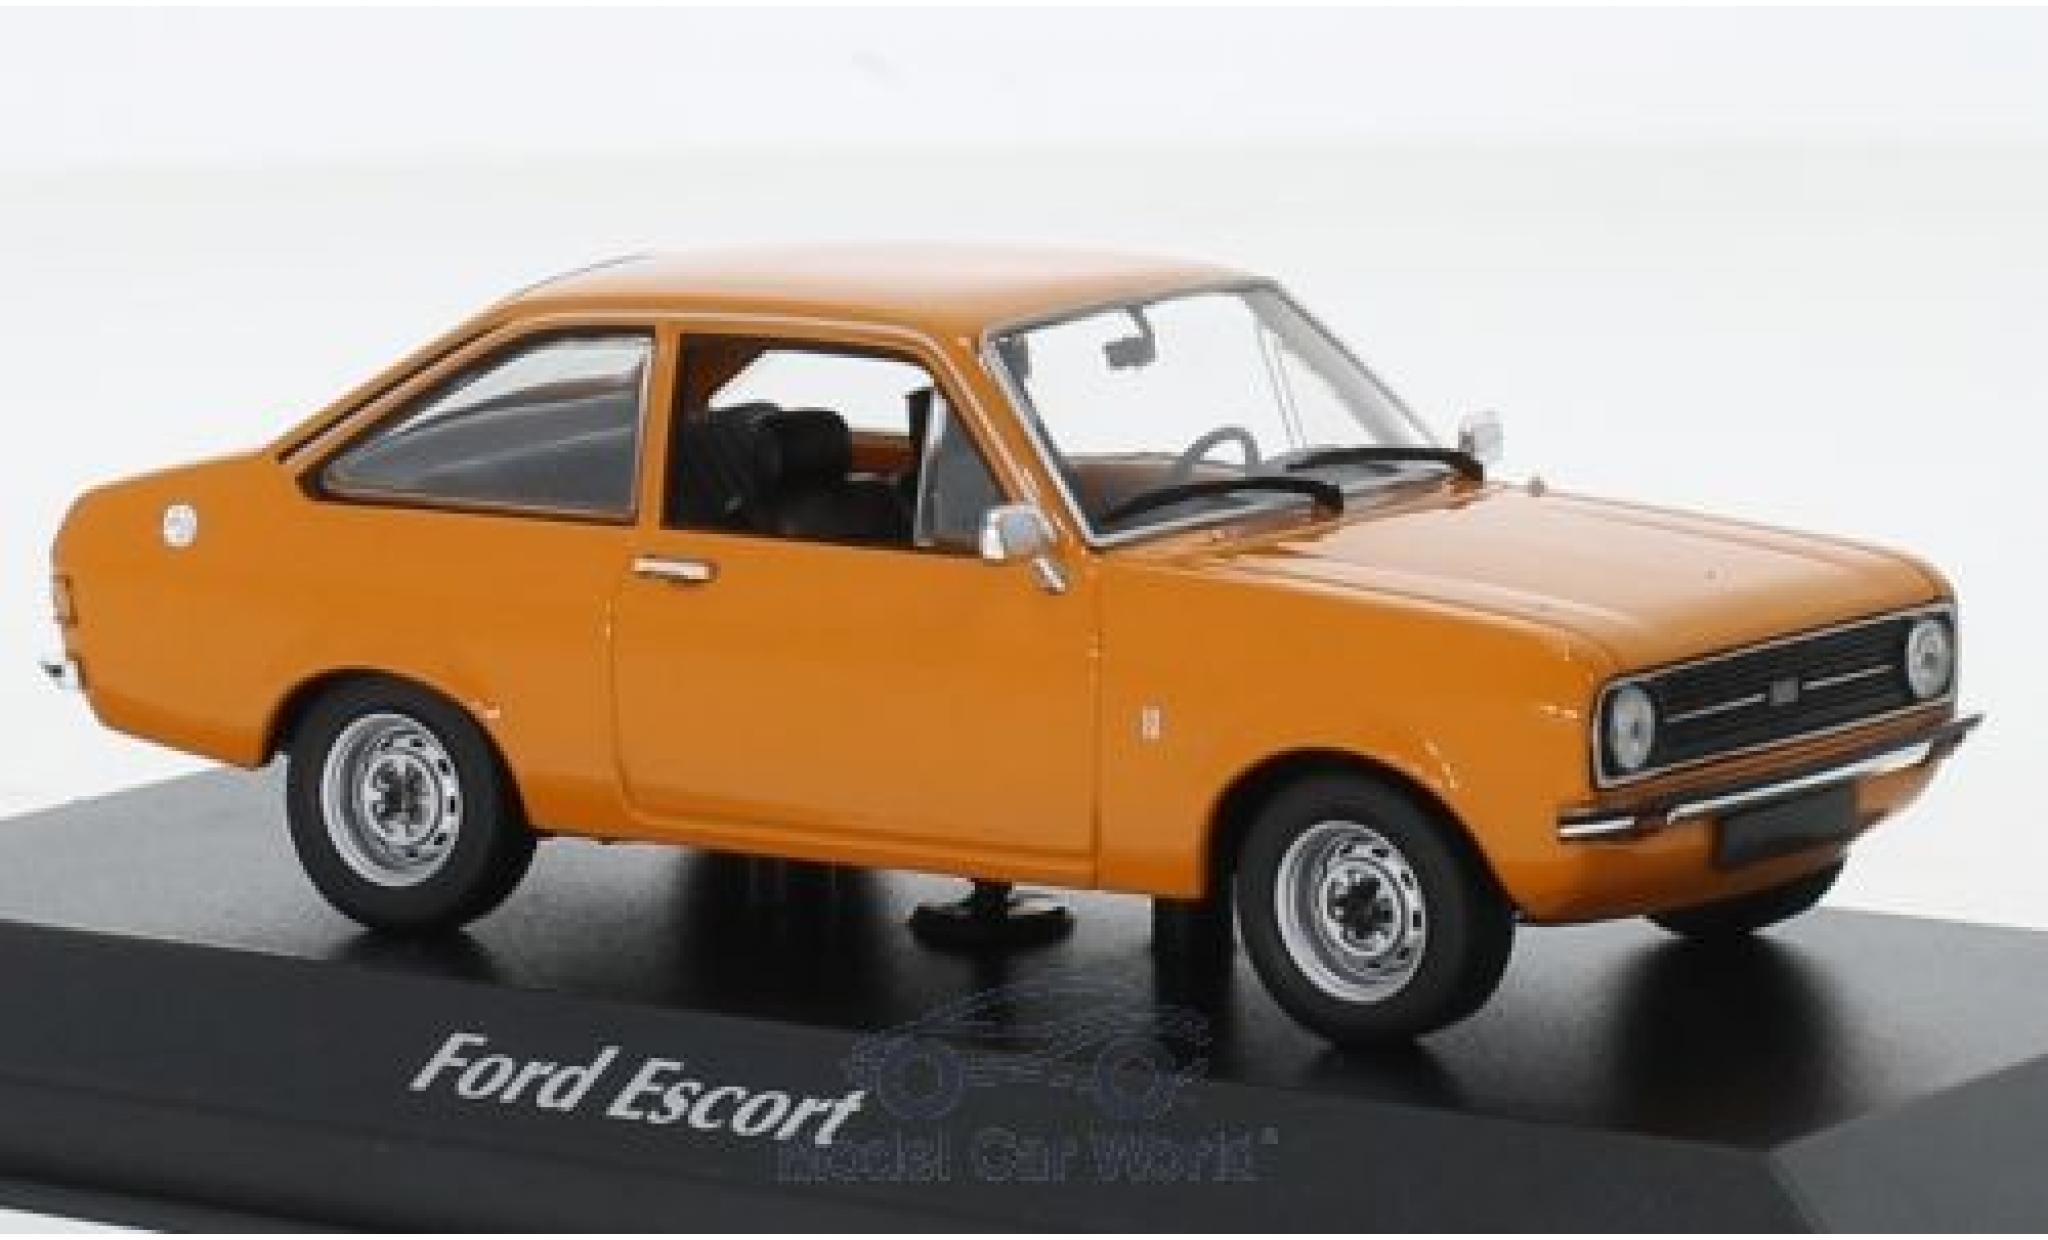 Ford Escort 1/43 Maxichamps 1.3 orange 1975